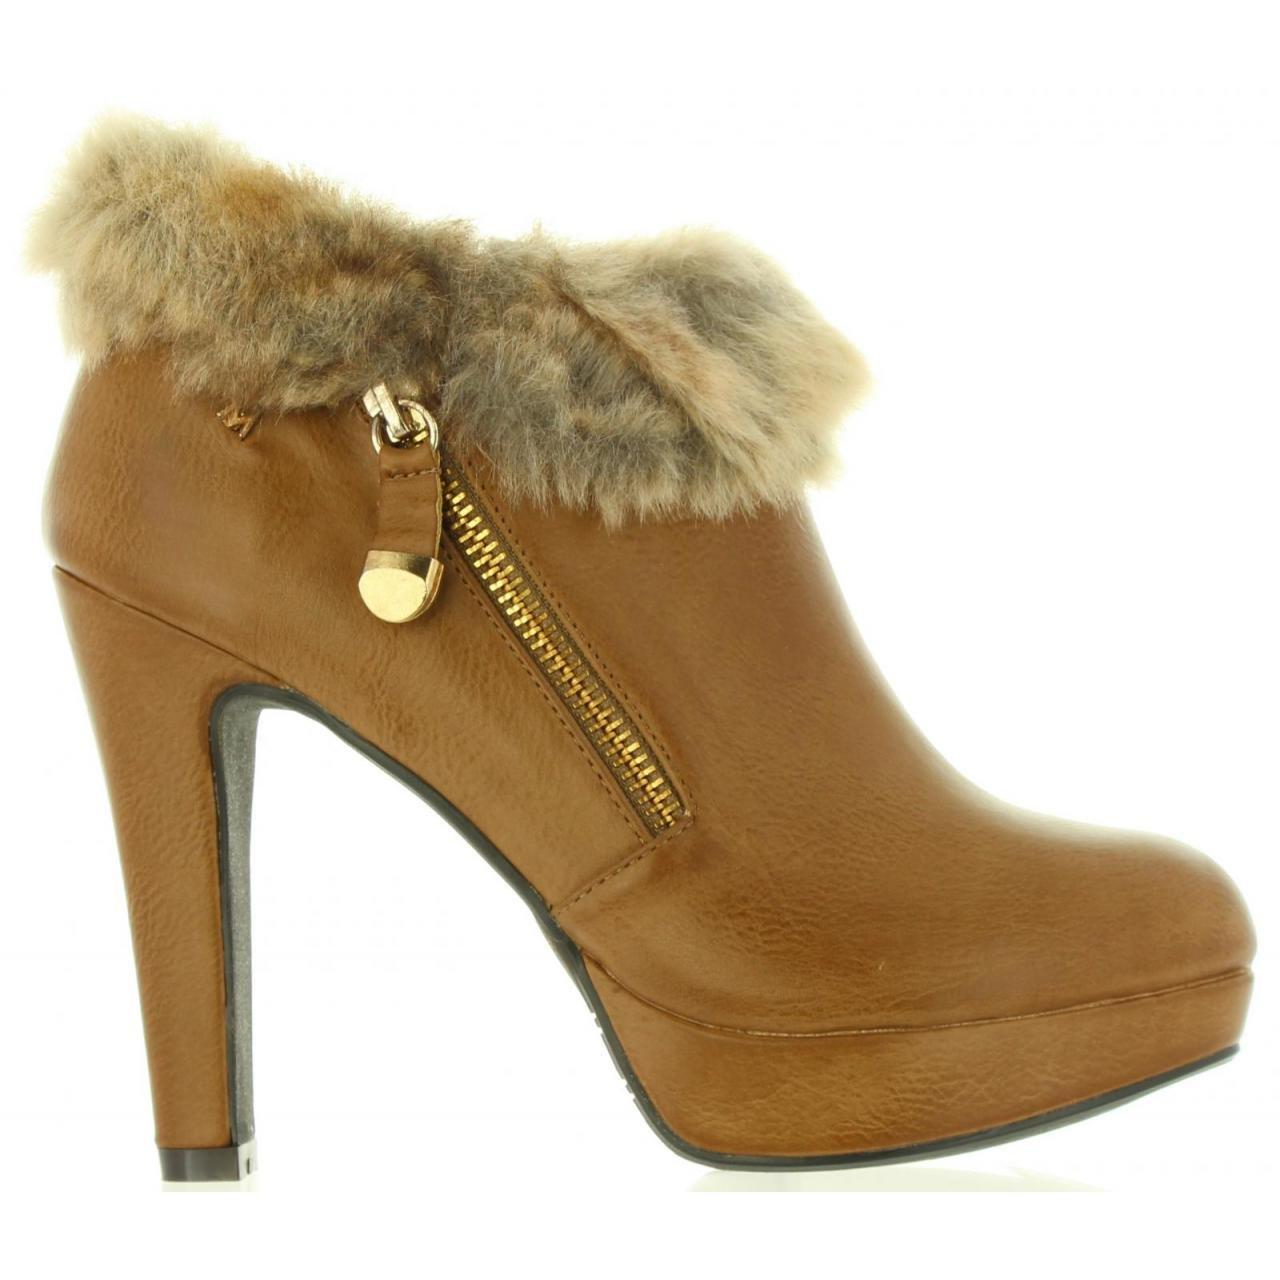 Maria Mare Schuhe Ferse für Damen 61004 C21008 NAPAL Taupe